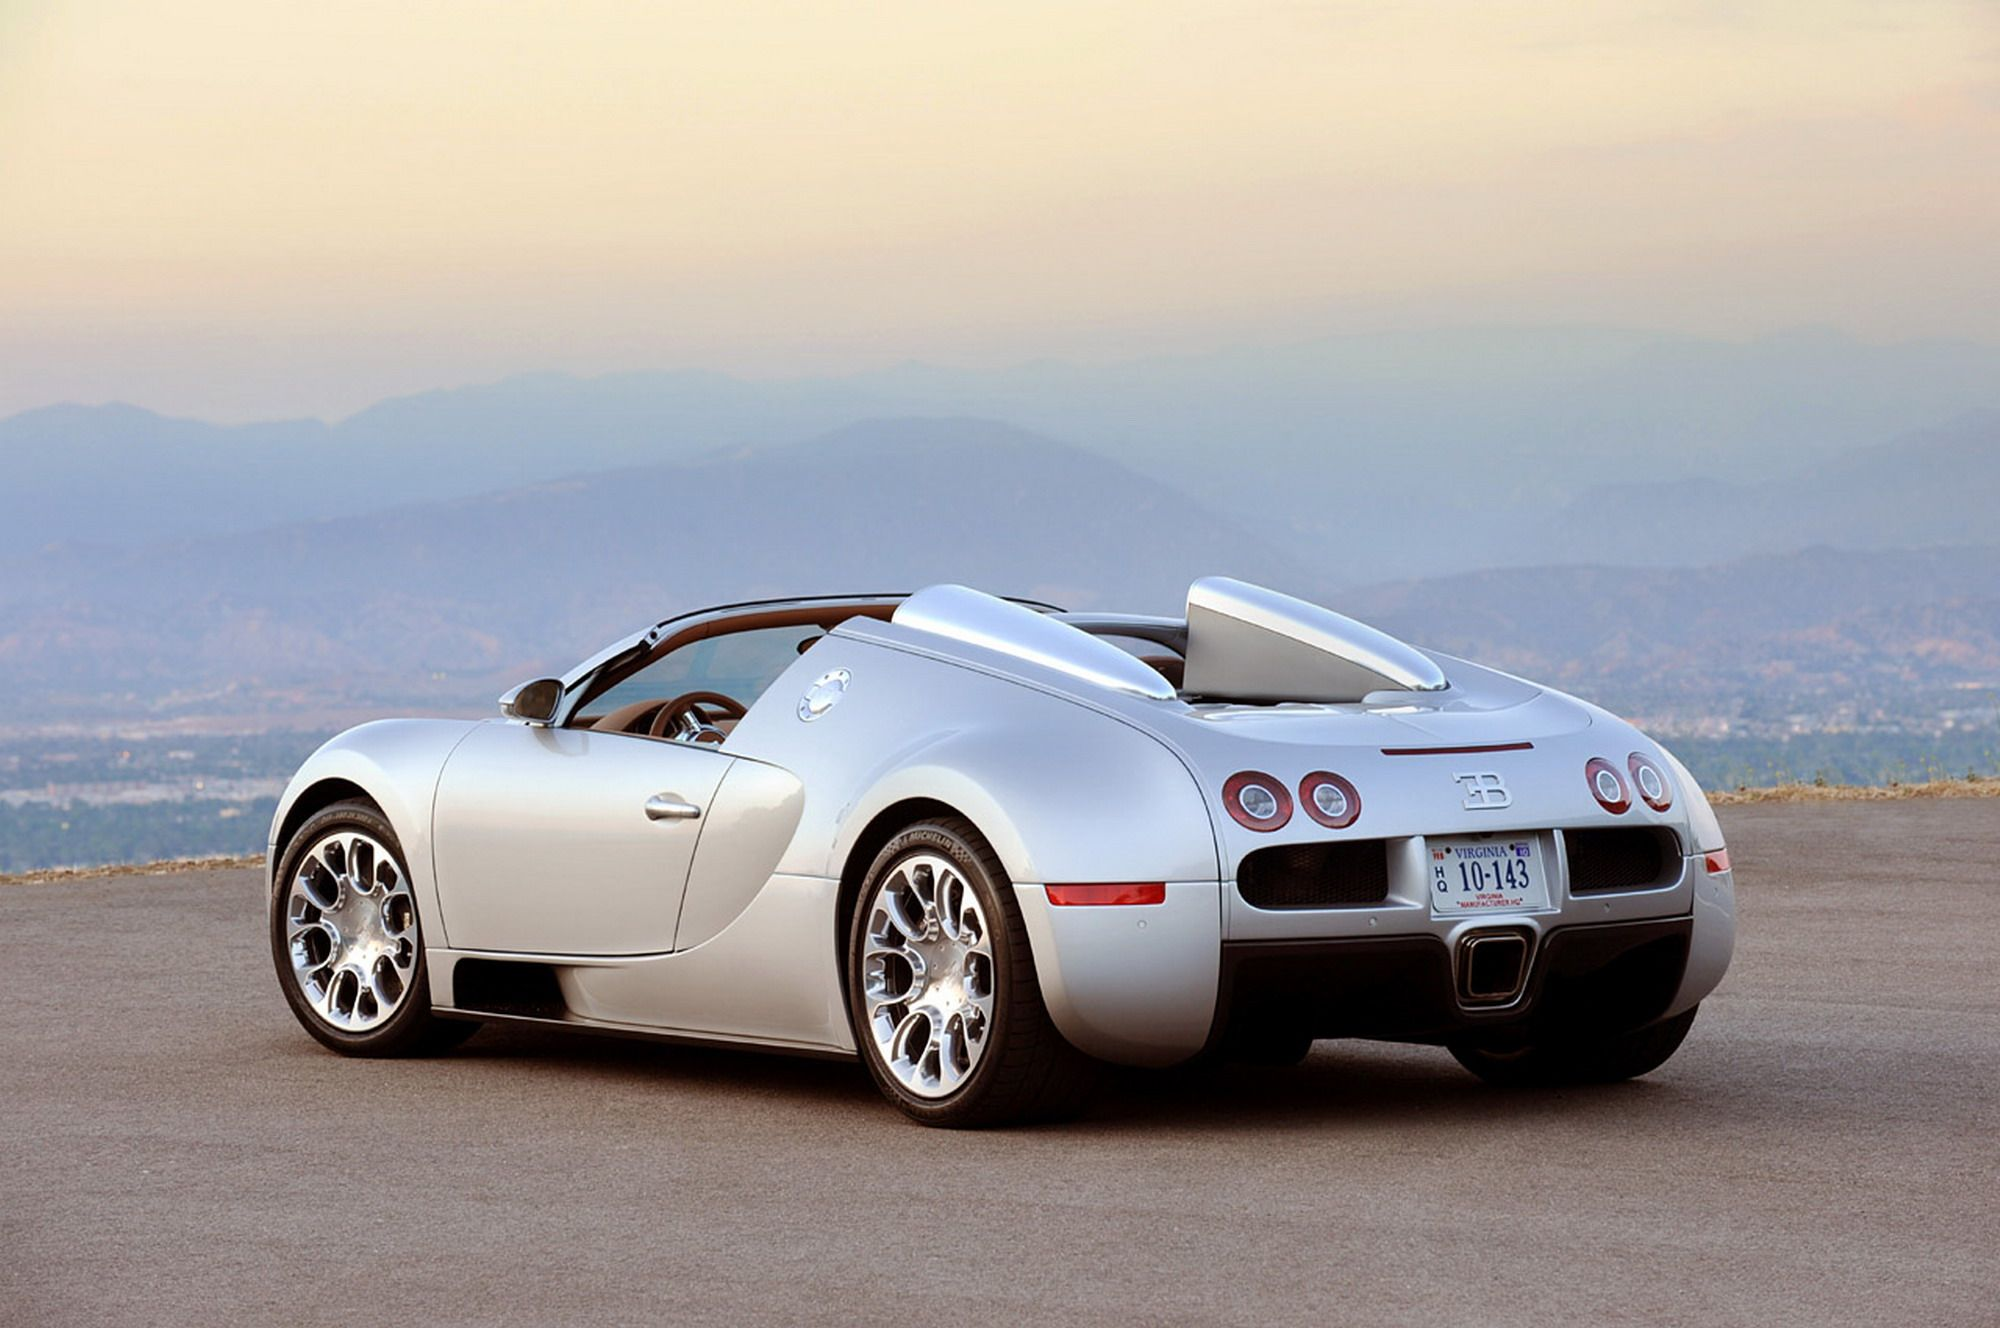 daae68f76db8a93e2d51bdca7fb6028d Remarkable Bugatti Veyron Grand Sport Vitesse Informacion Cars Trend